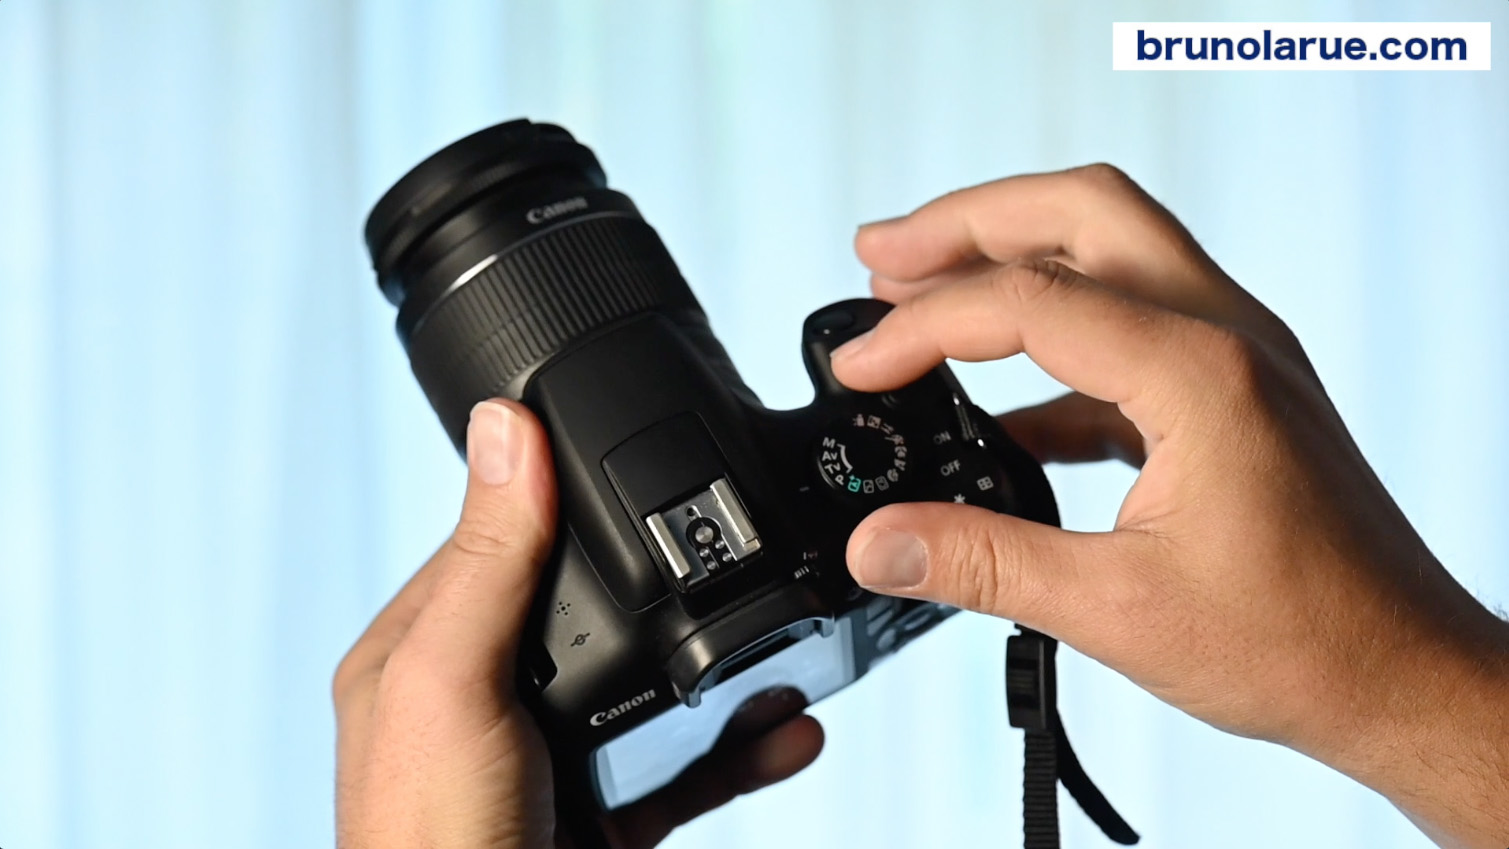 appareil photo Bruno Larue